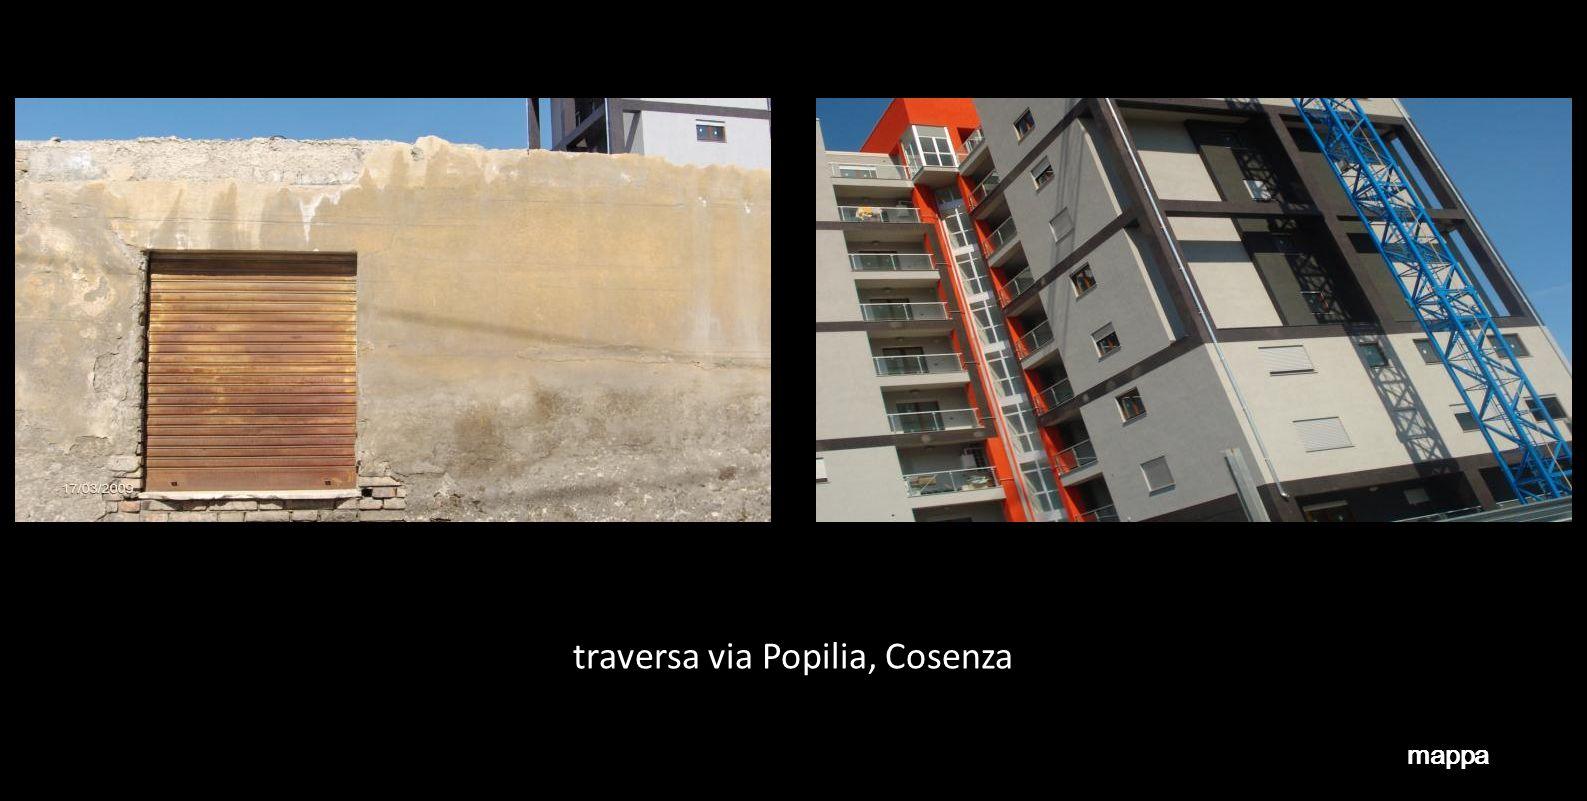 traversa via Popilia, Cosenza